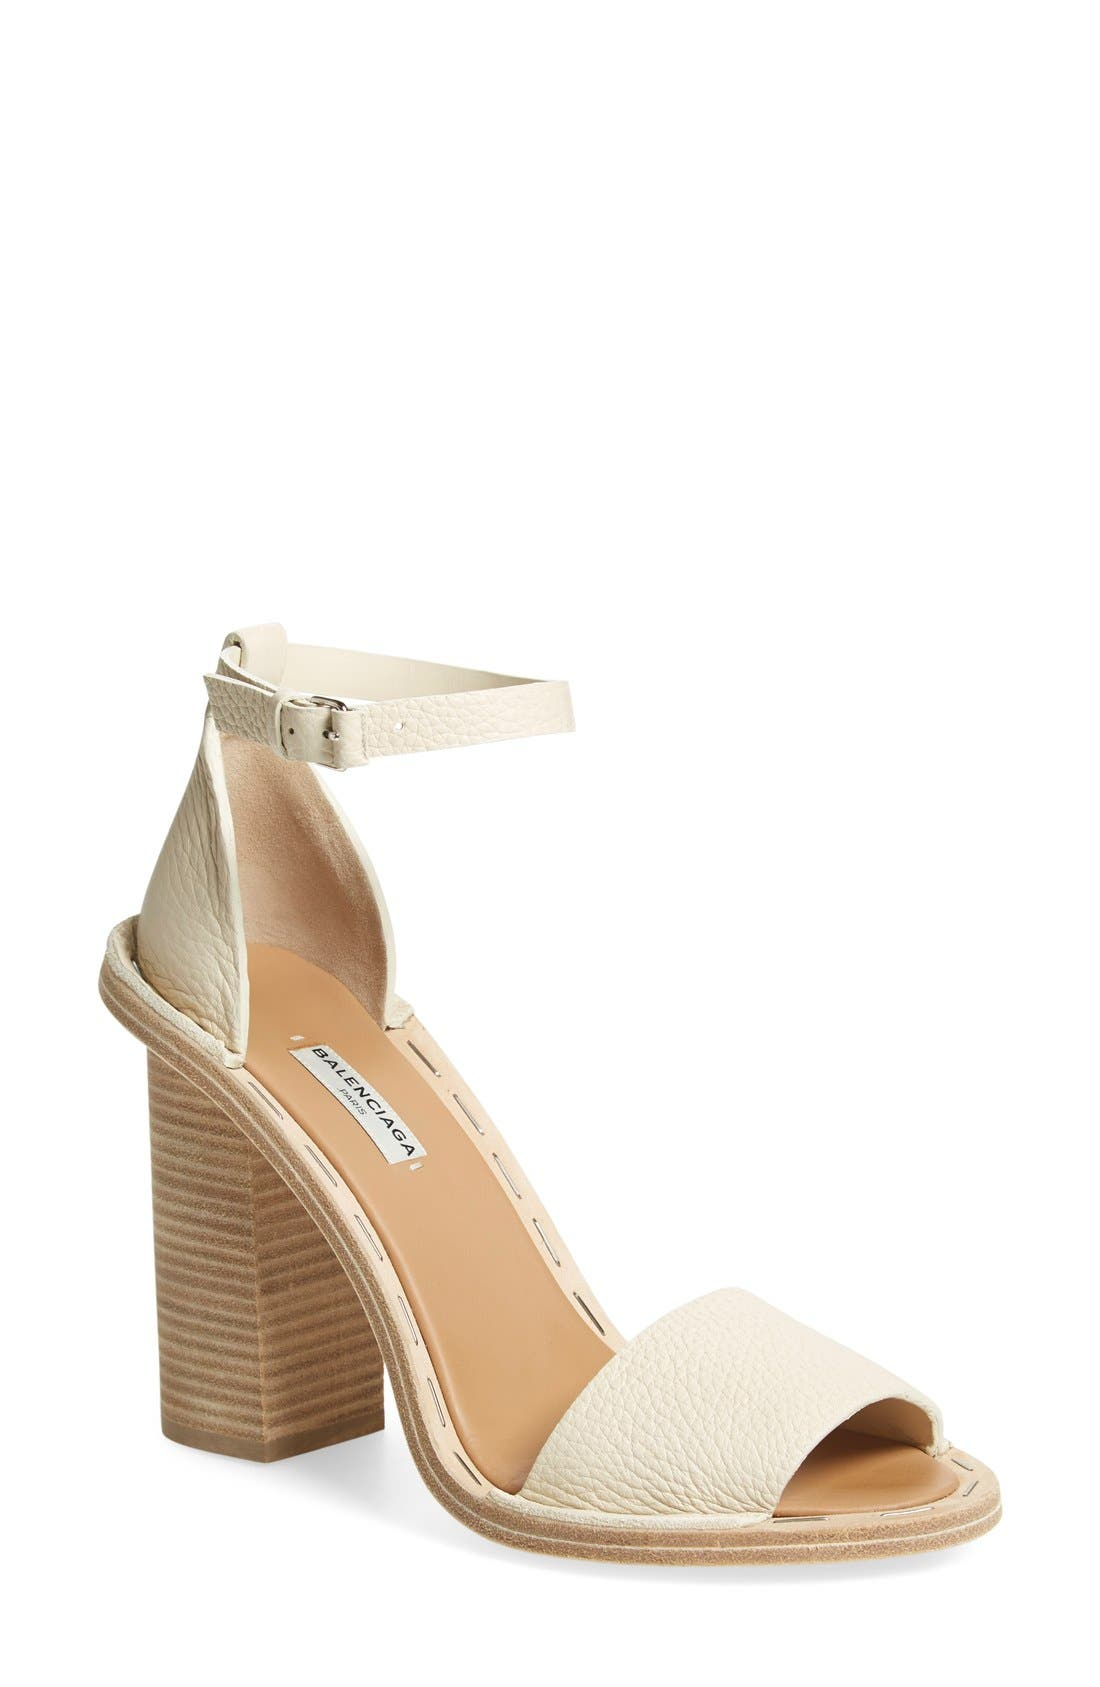 Main Image - Balenciaga Wood Heel Sandal (Women)